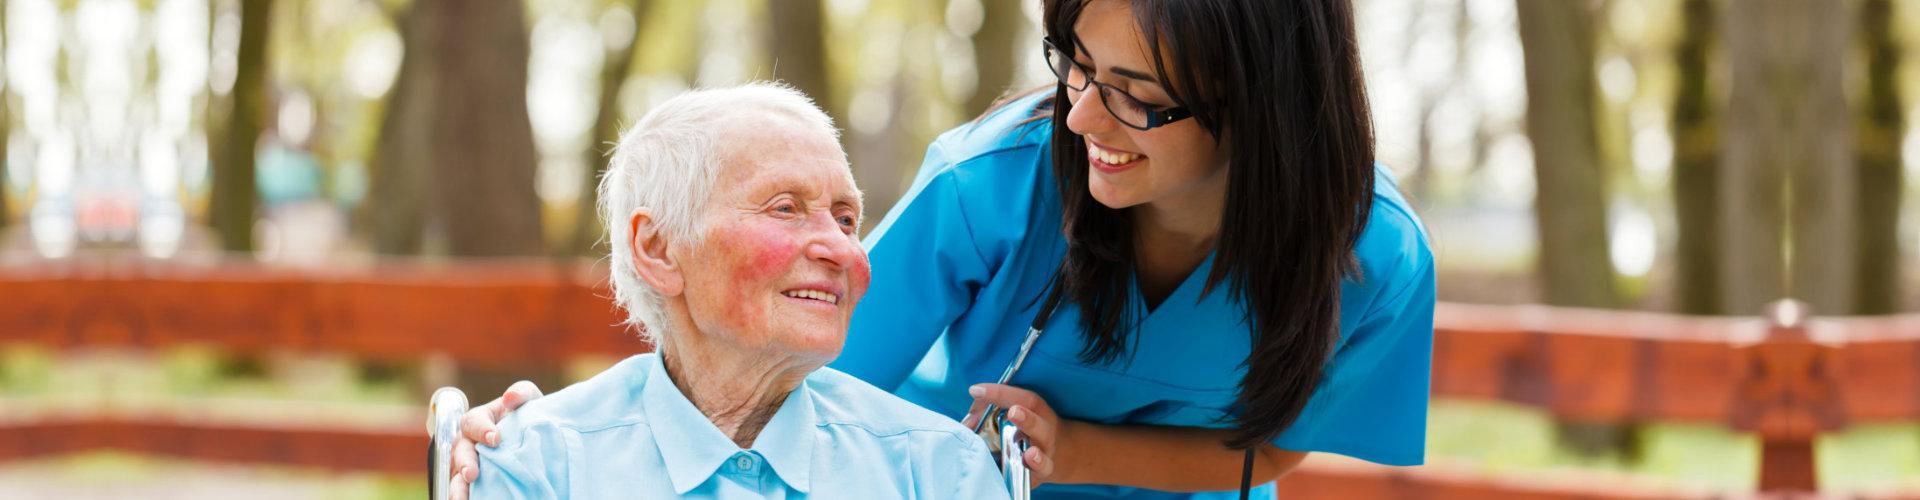 caregiver and her senior patient